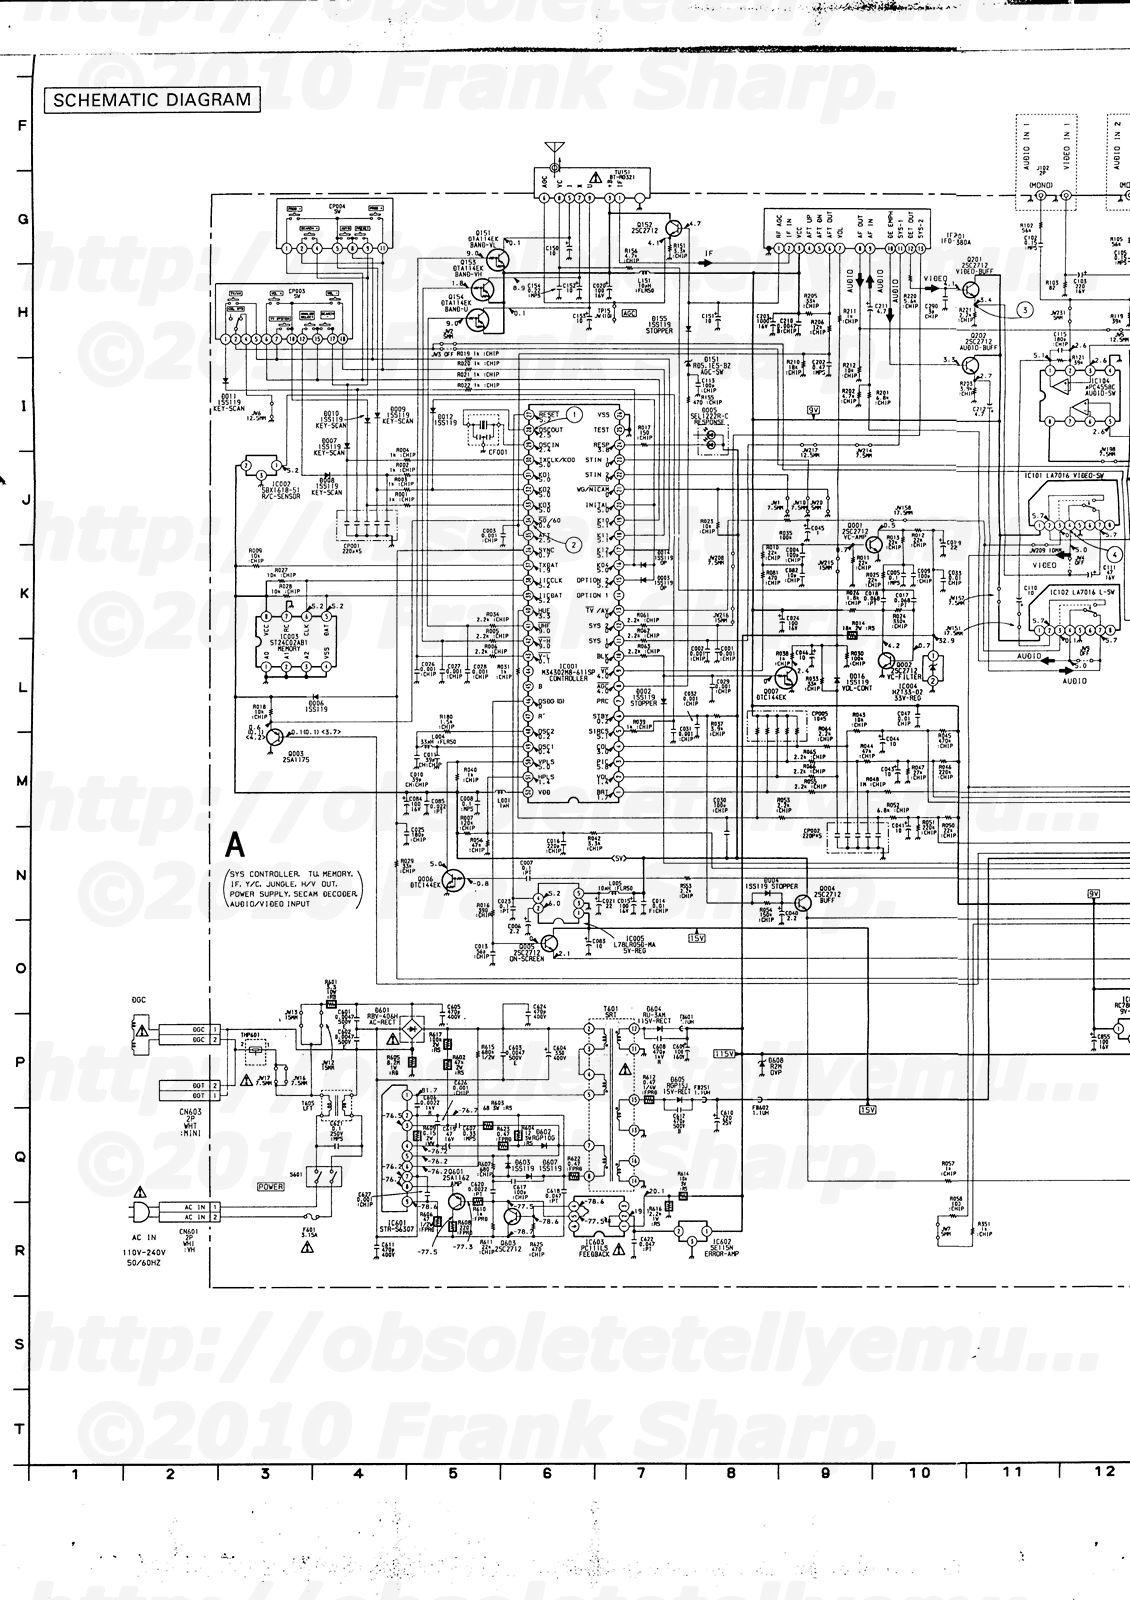 Obsolete Technology Tellye !: SONY KV-1484MT CHASSIS SCC